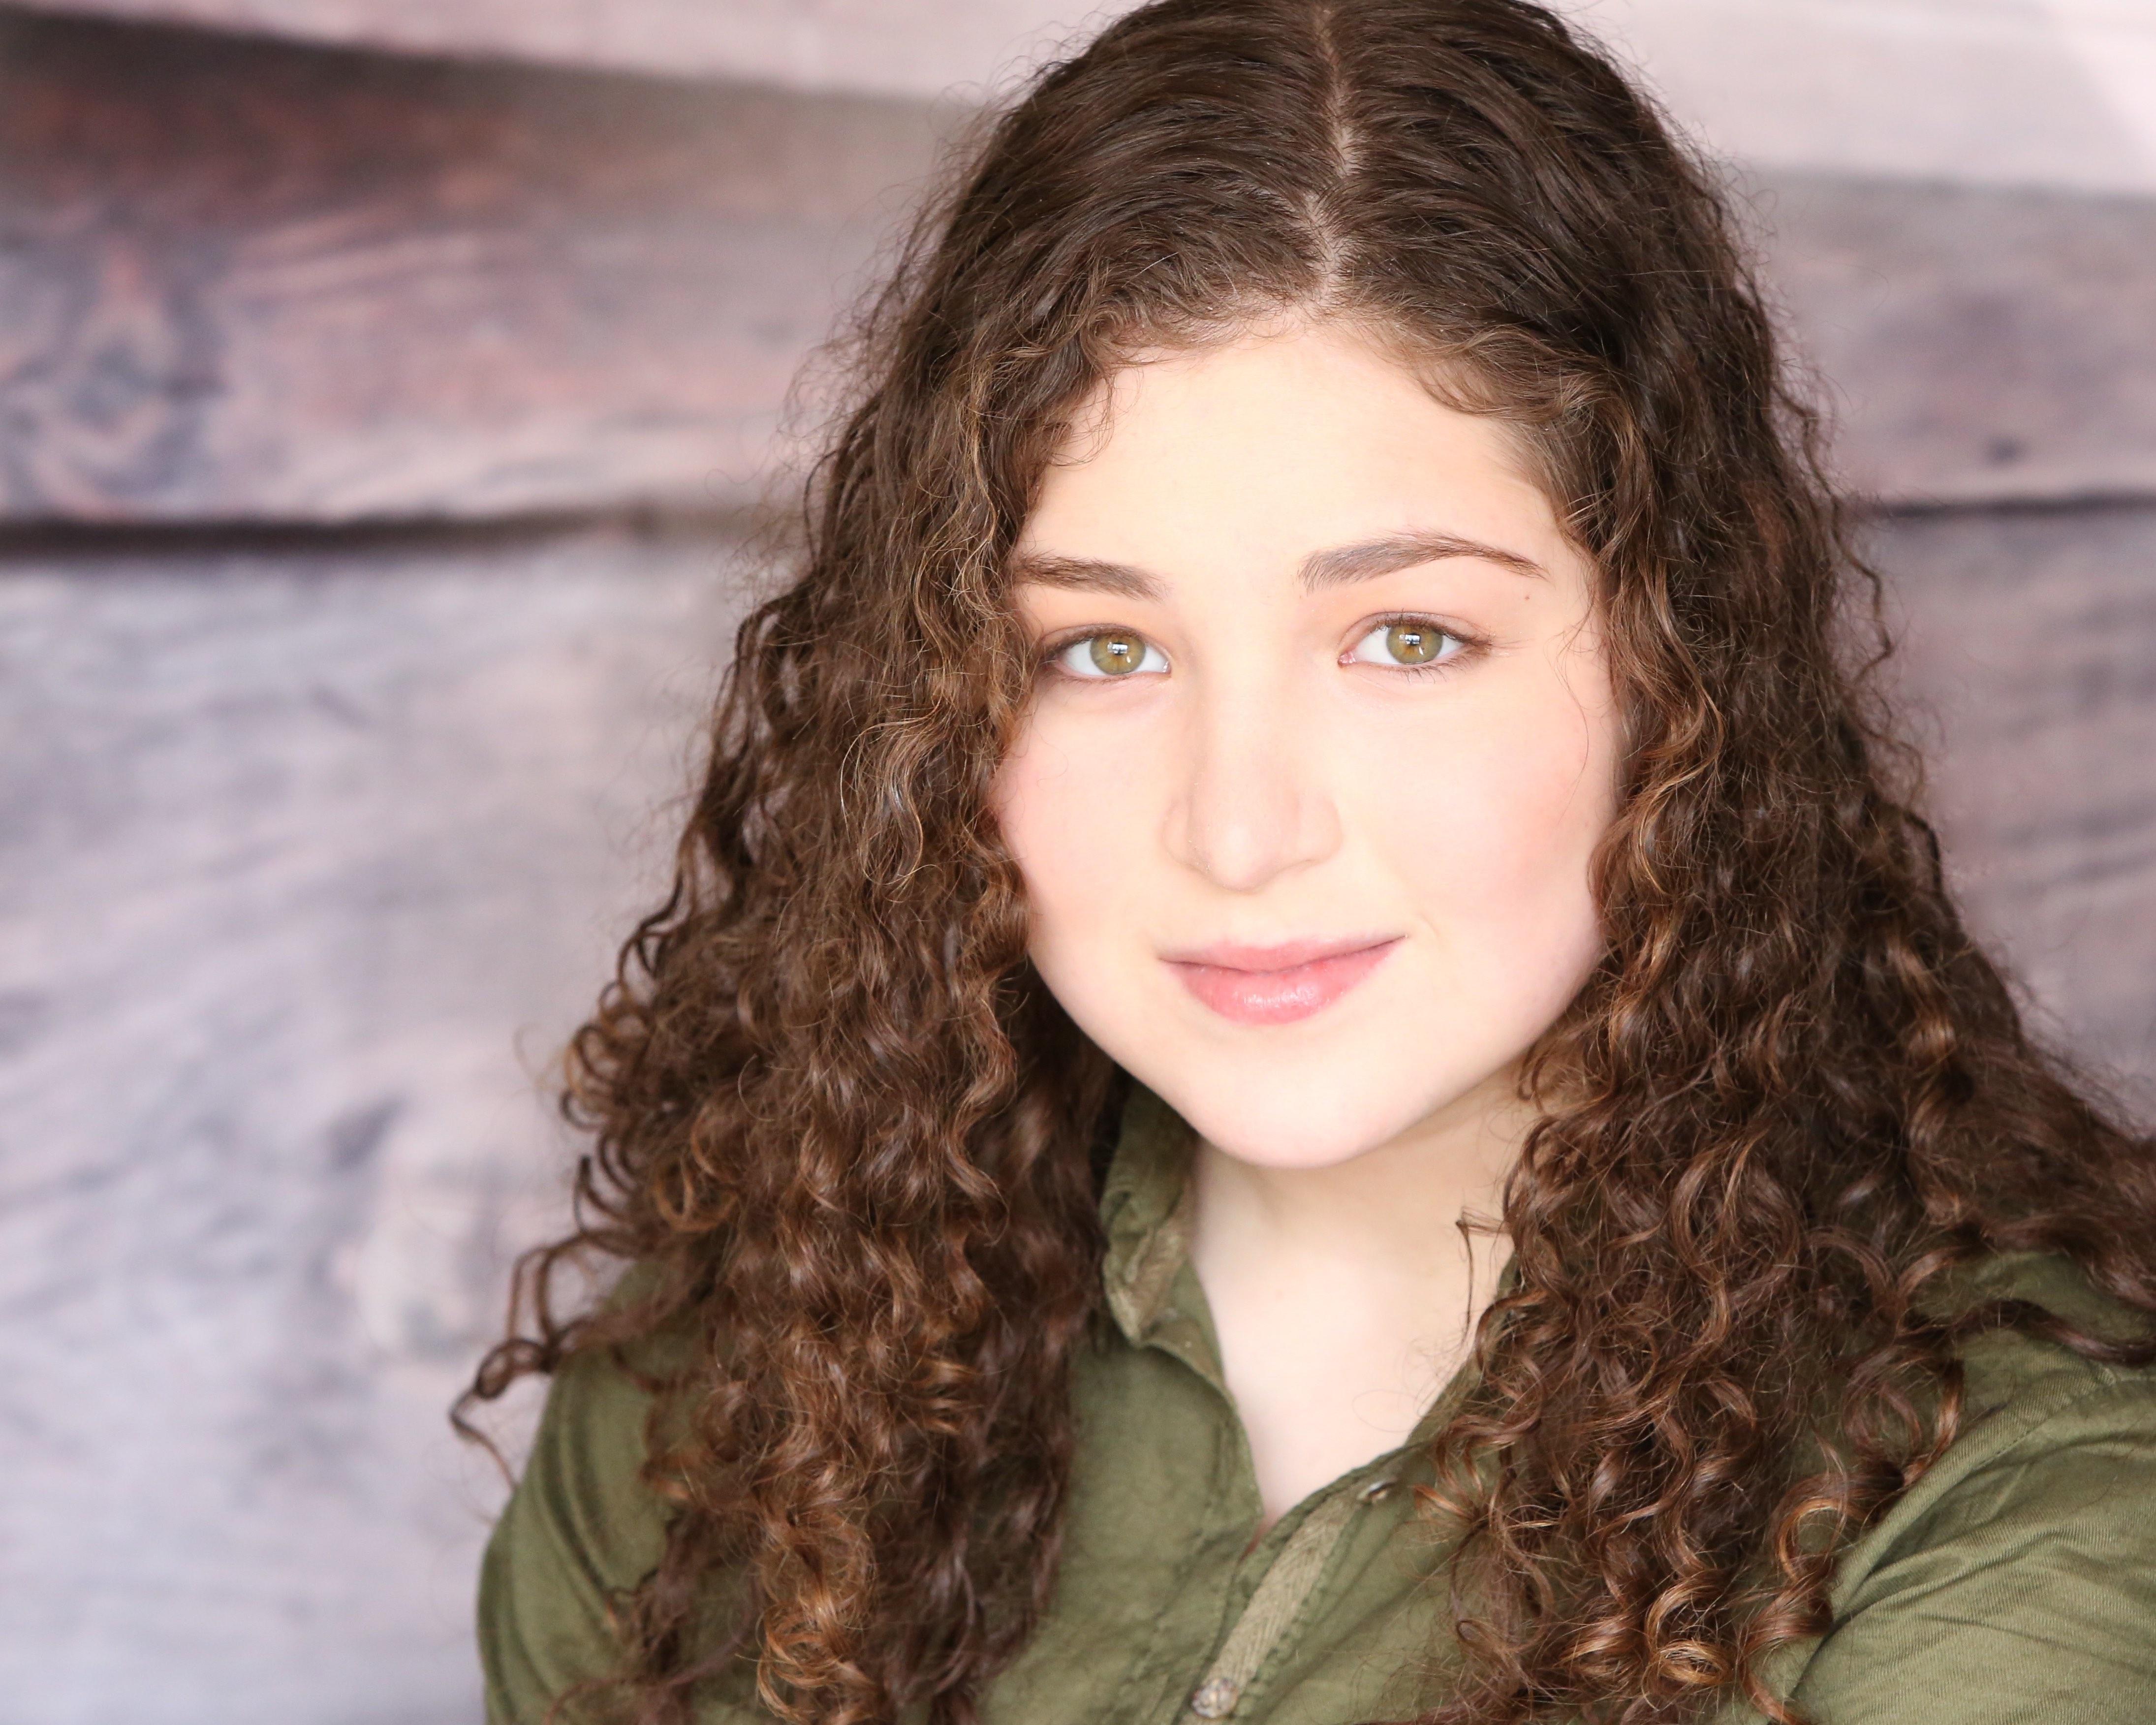 Rachel Covey